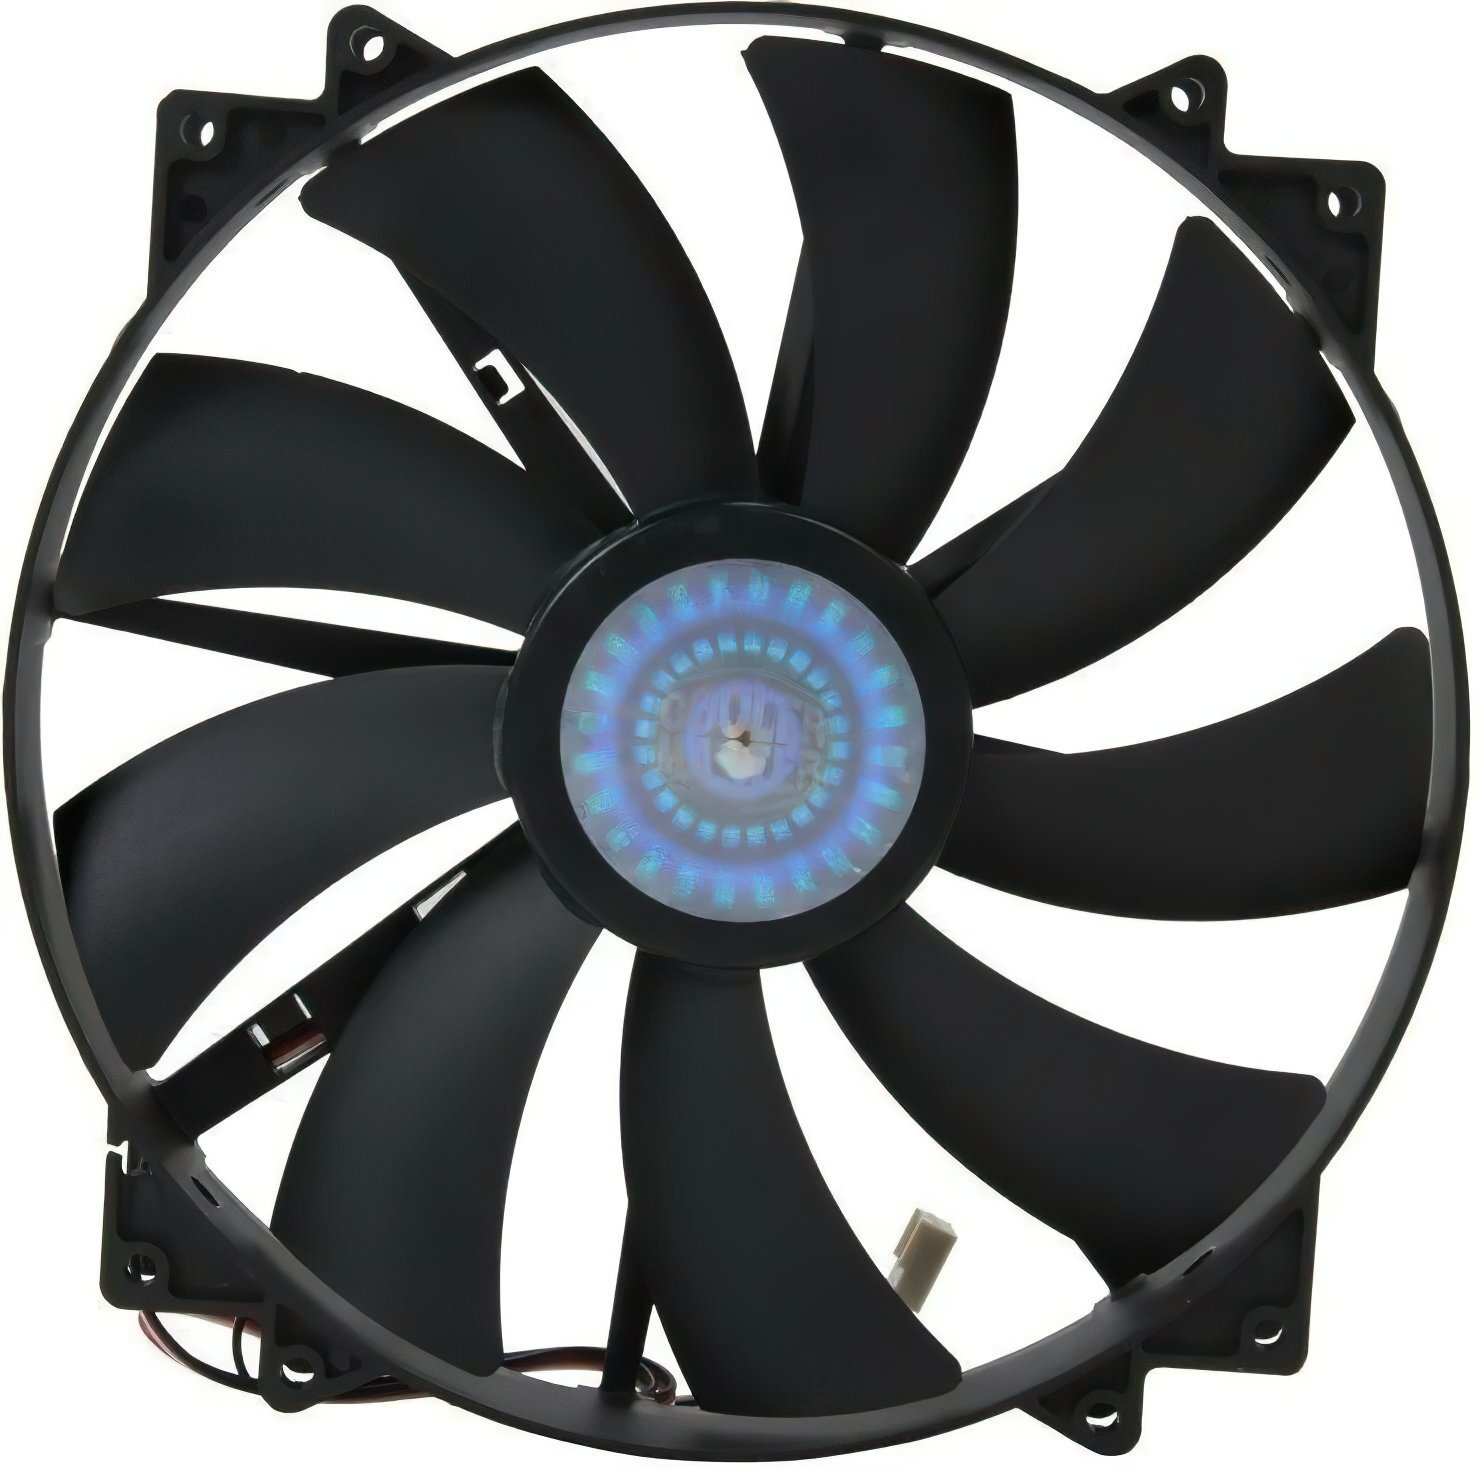 Корпусний вентилятор Cooler Master MegaFlow 200 Silent Fan, w/o LED, 200мм, 3pin+Molex (R4-MFJR-07FK-R1)фото